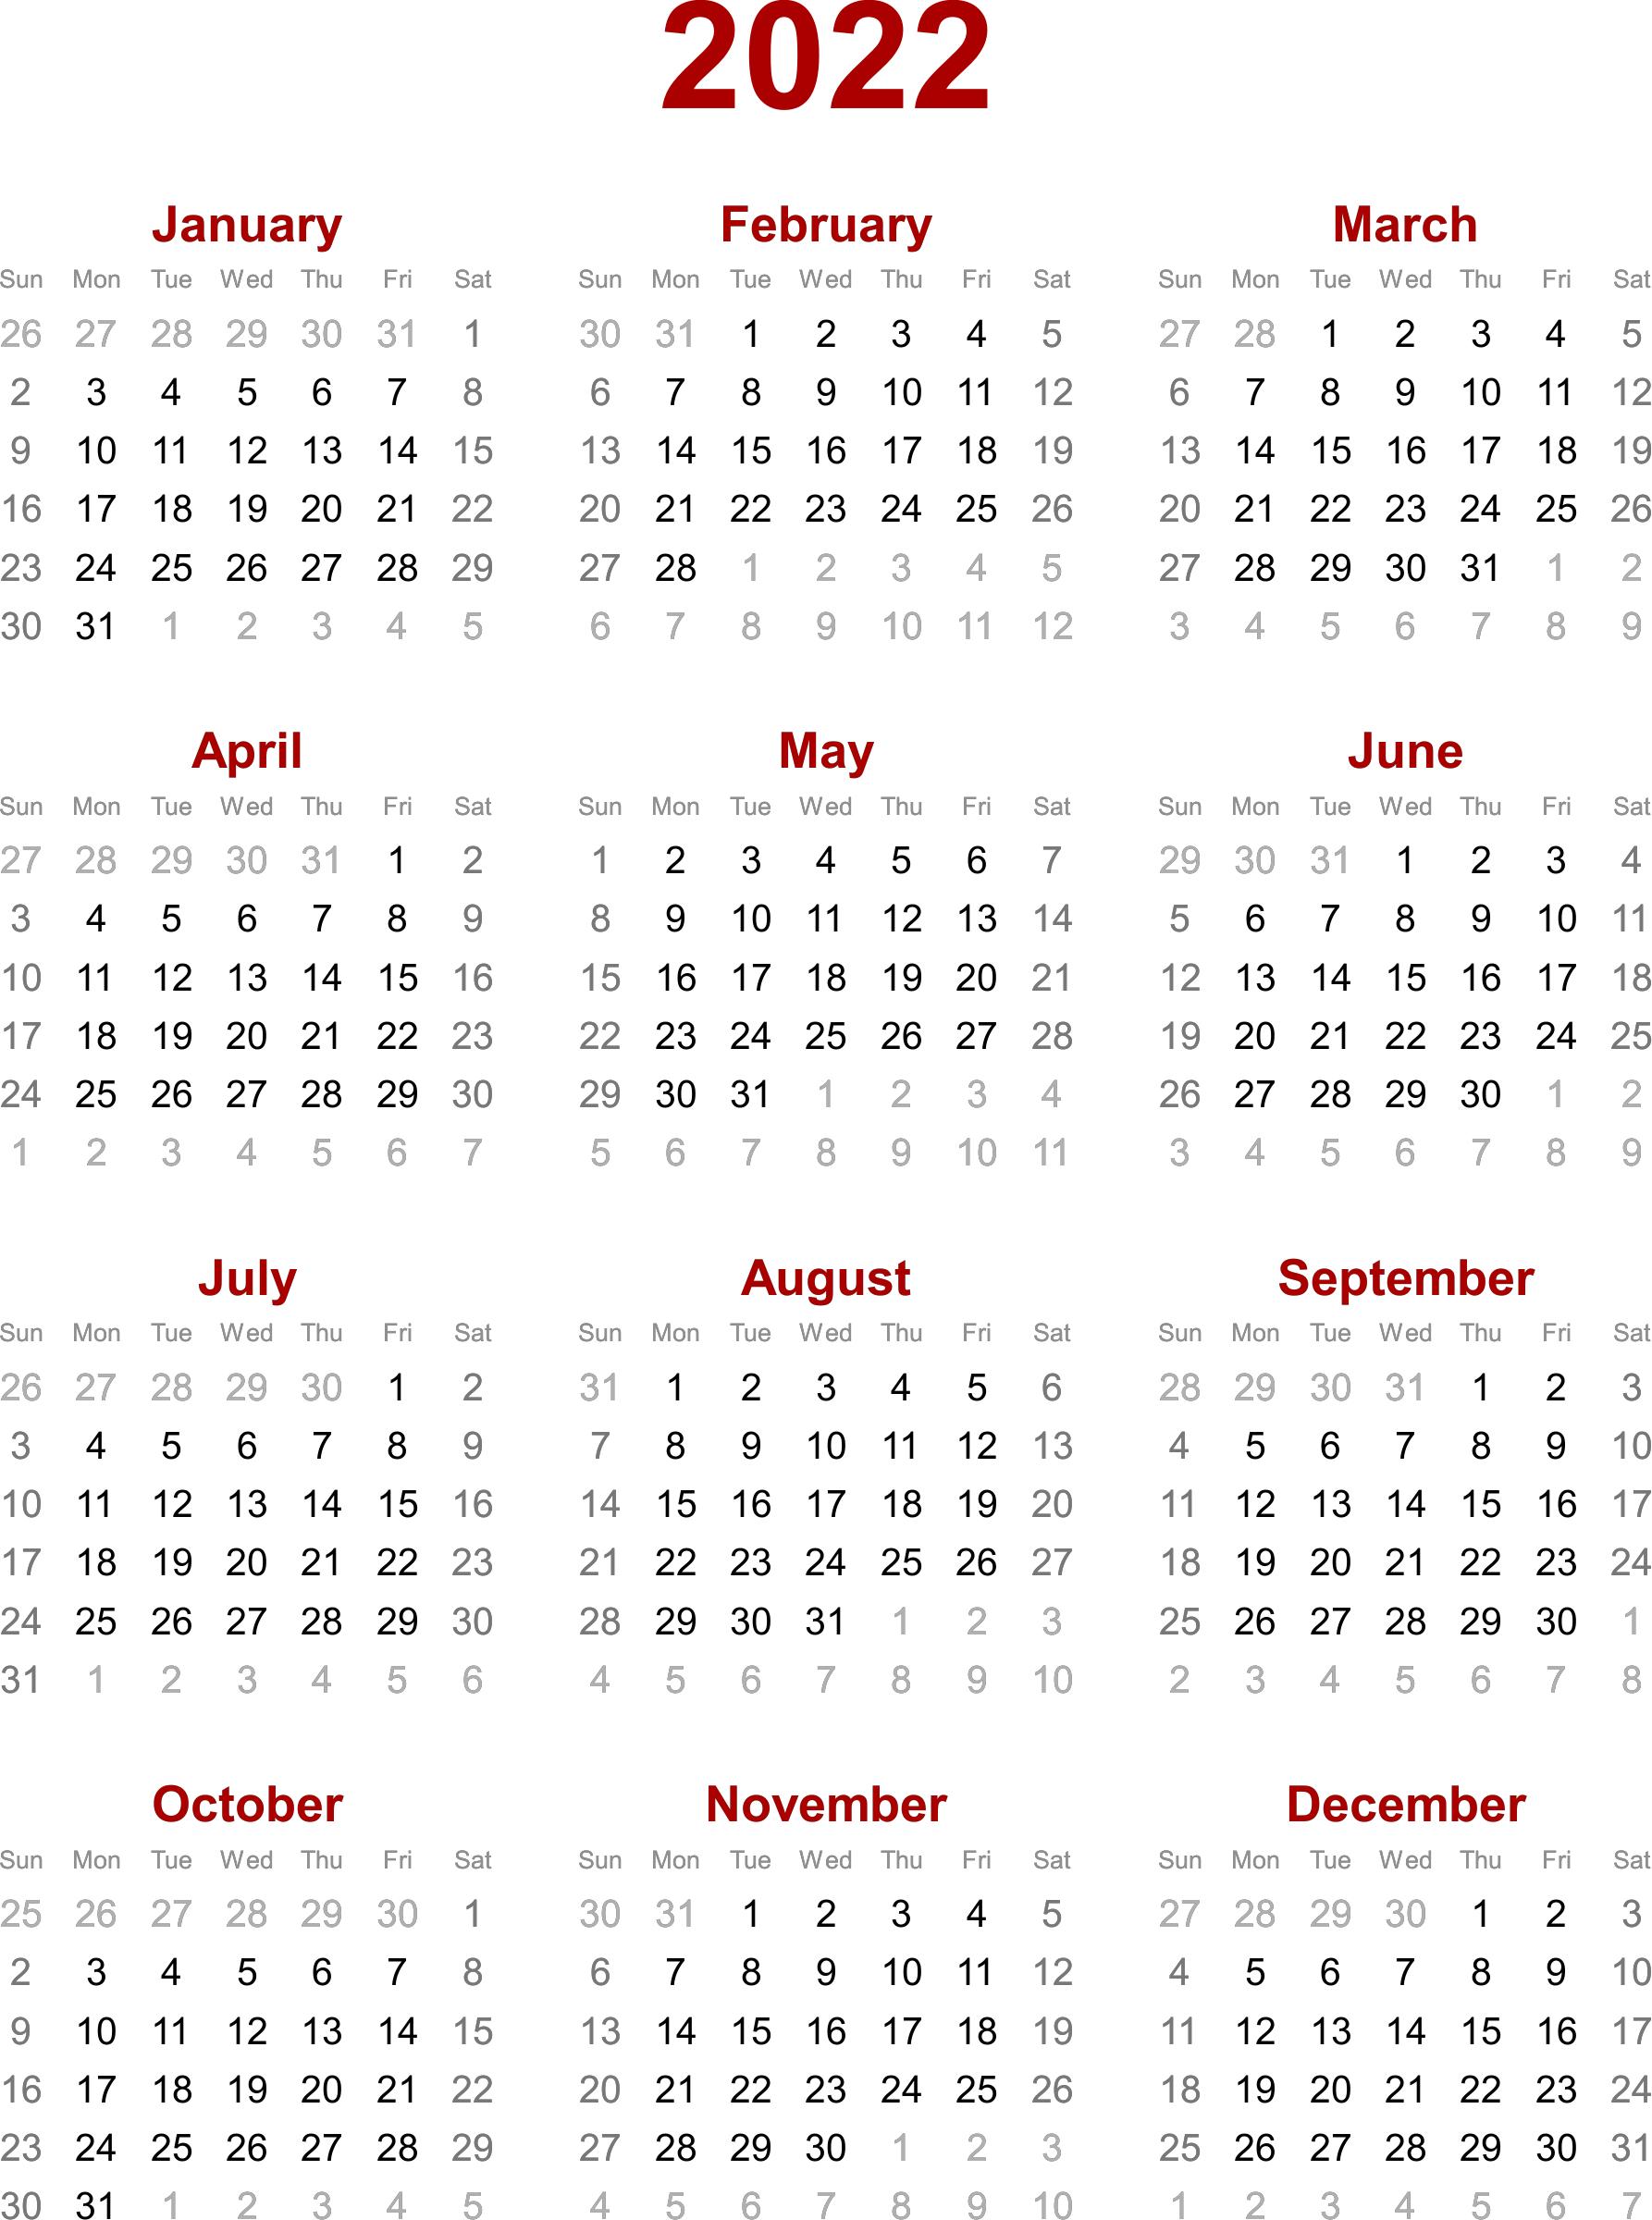 2022 Calendar Template For Excel